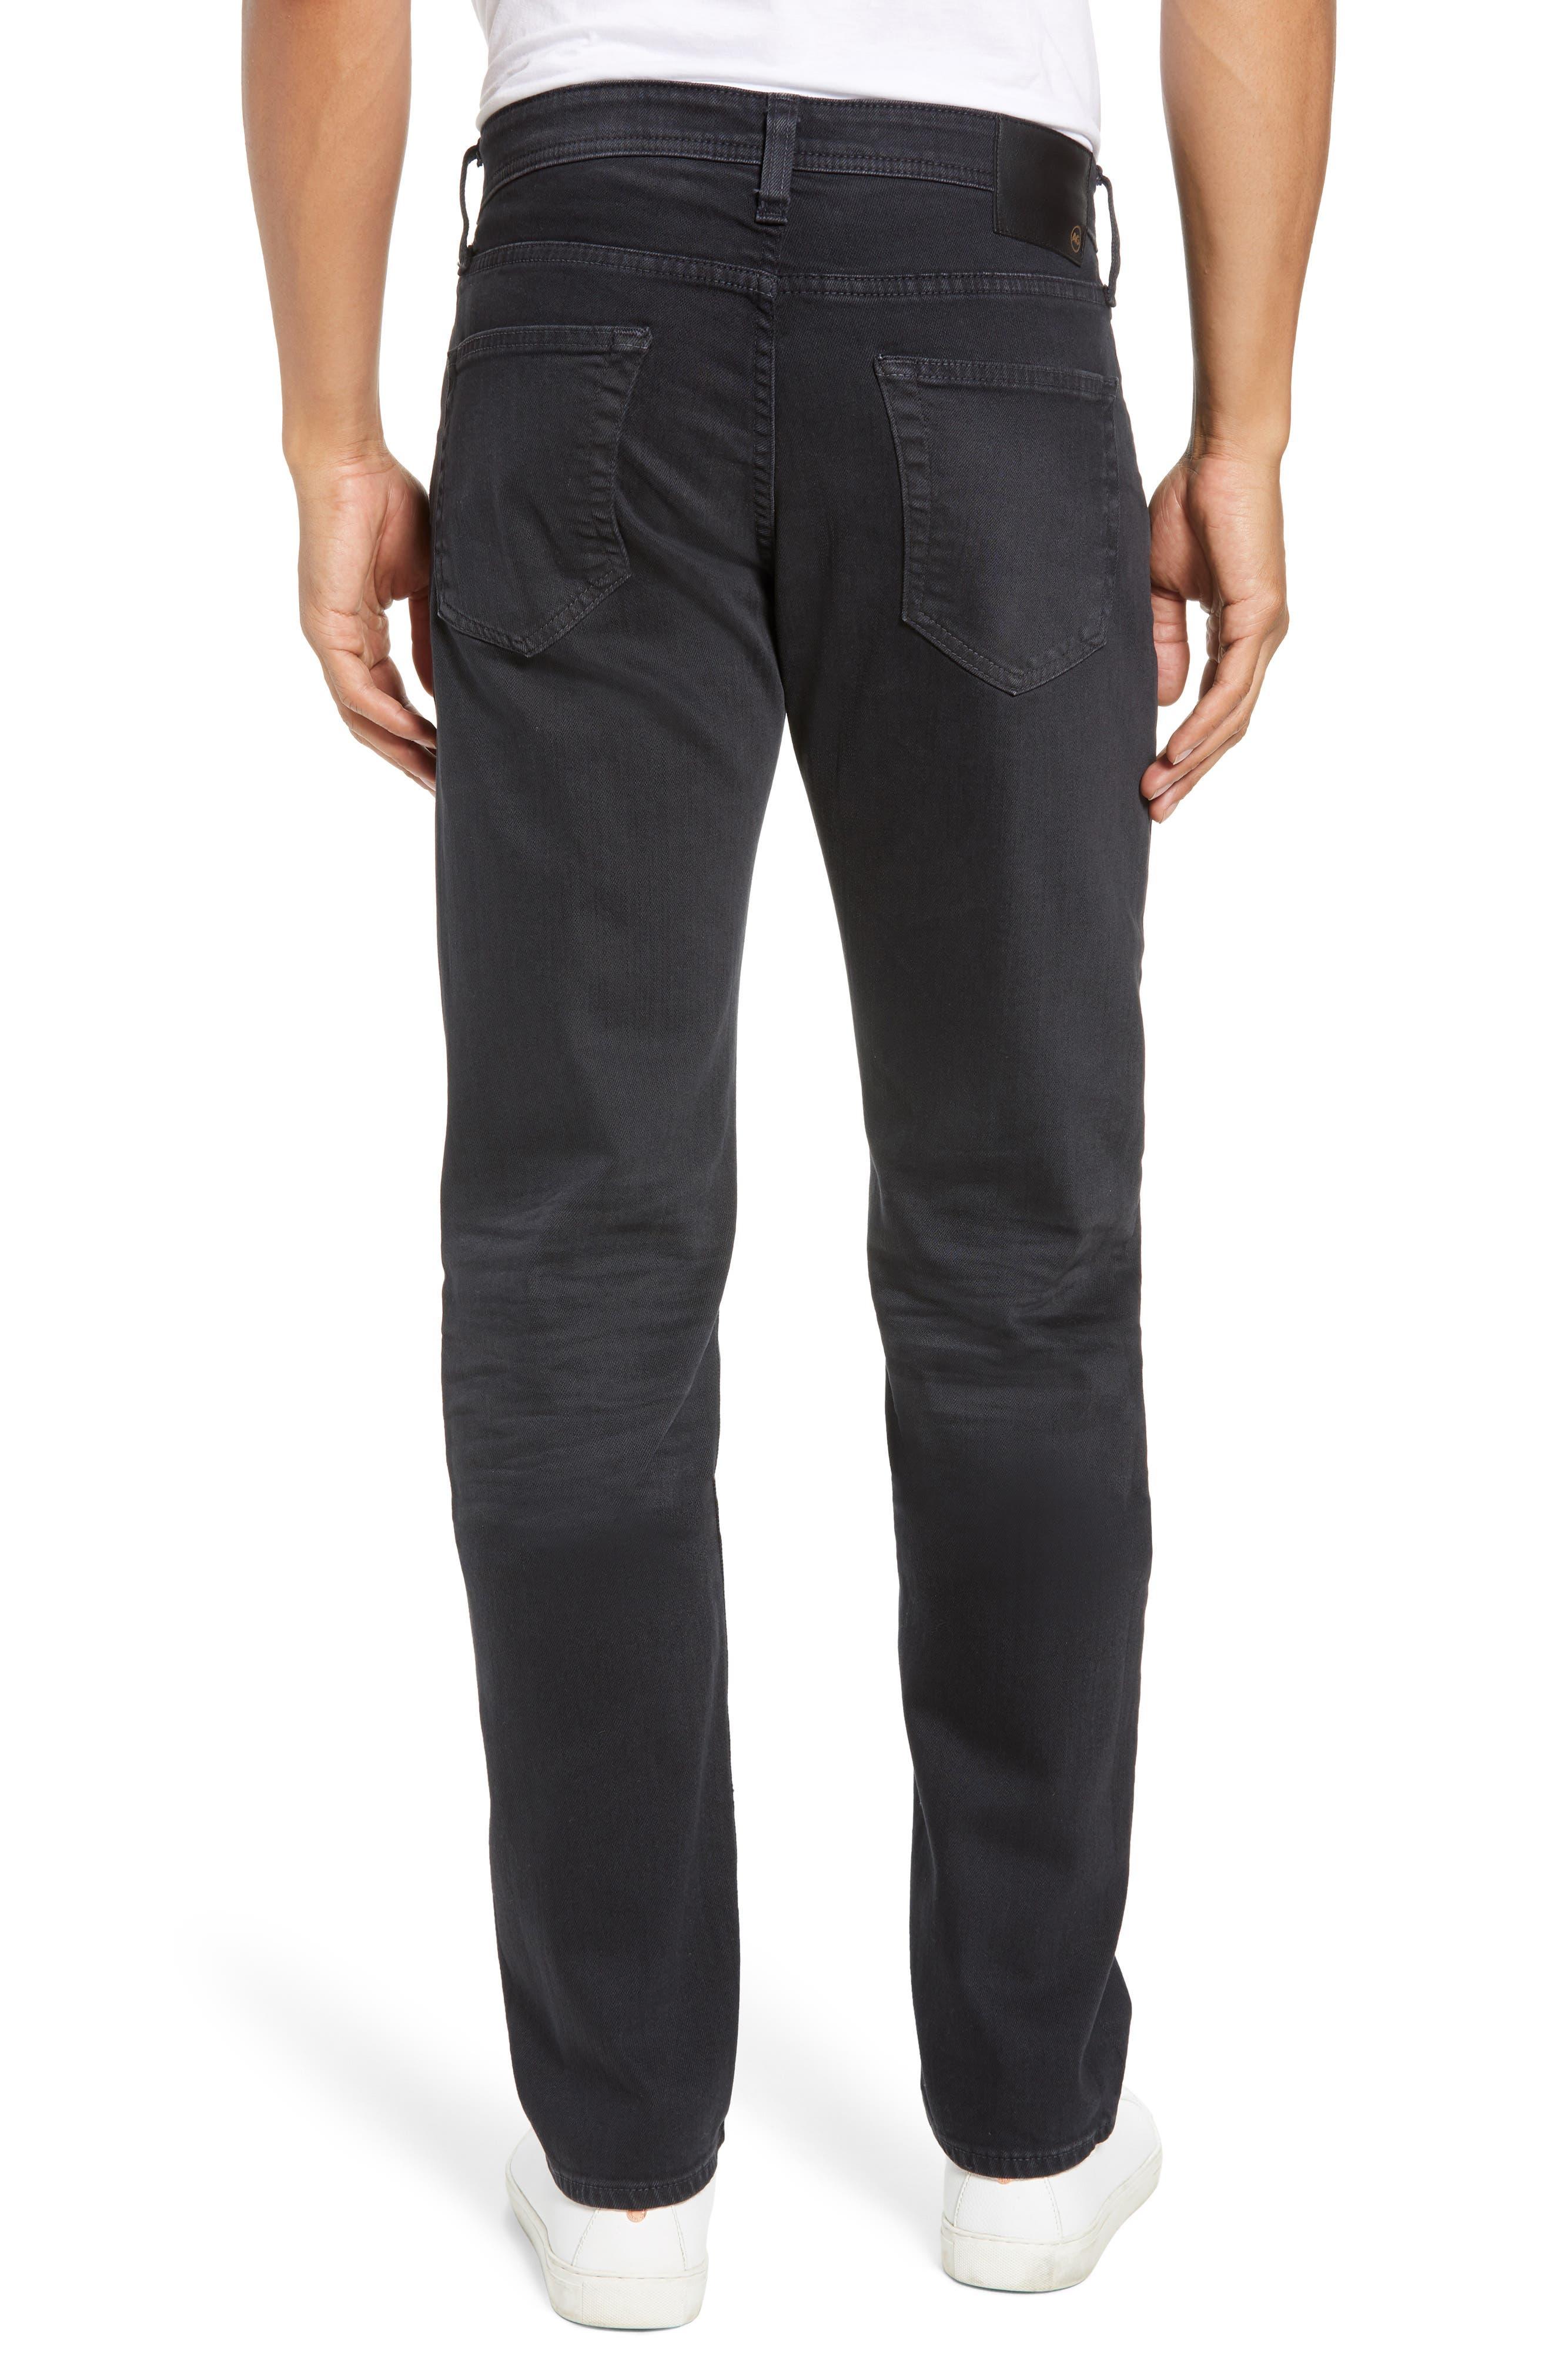 Tellis Slim Fit Jeans,                             Alternate thumbnail 2, color,                             7 YEARS GREY STONE